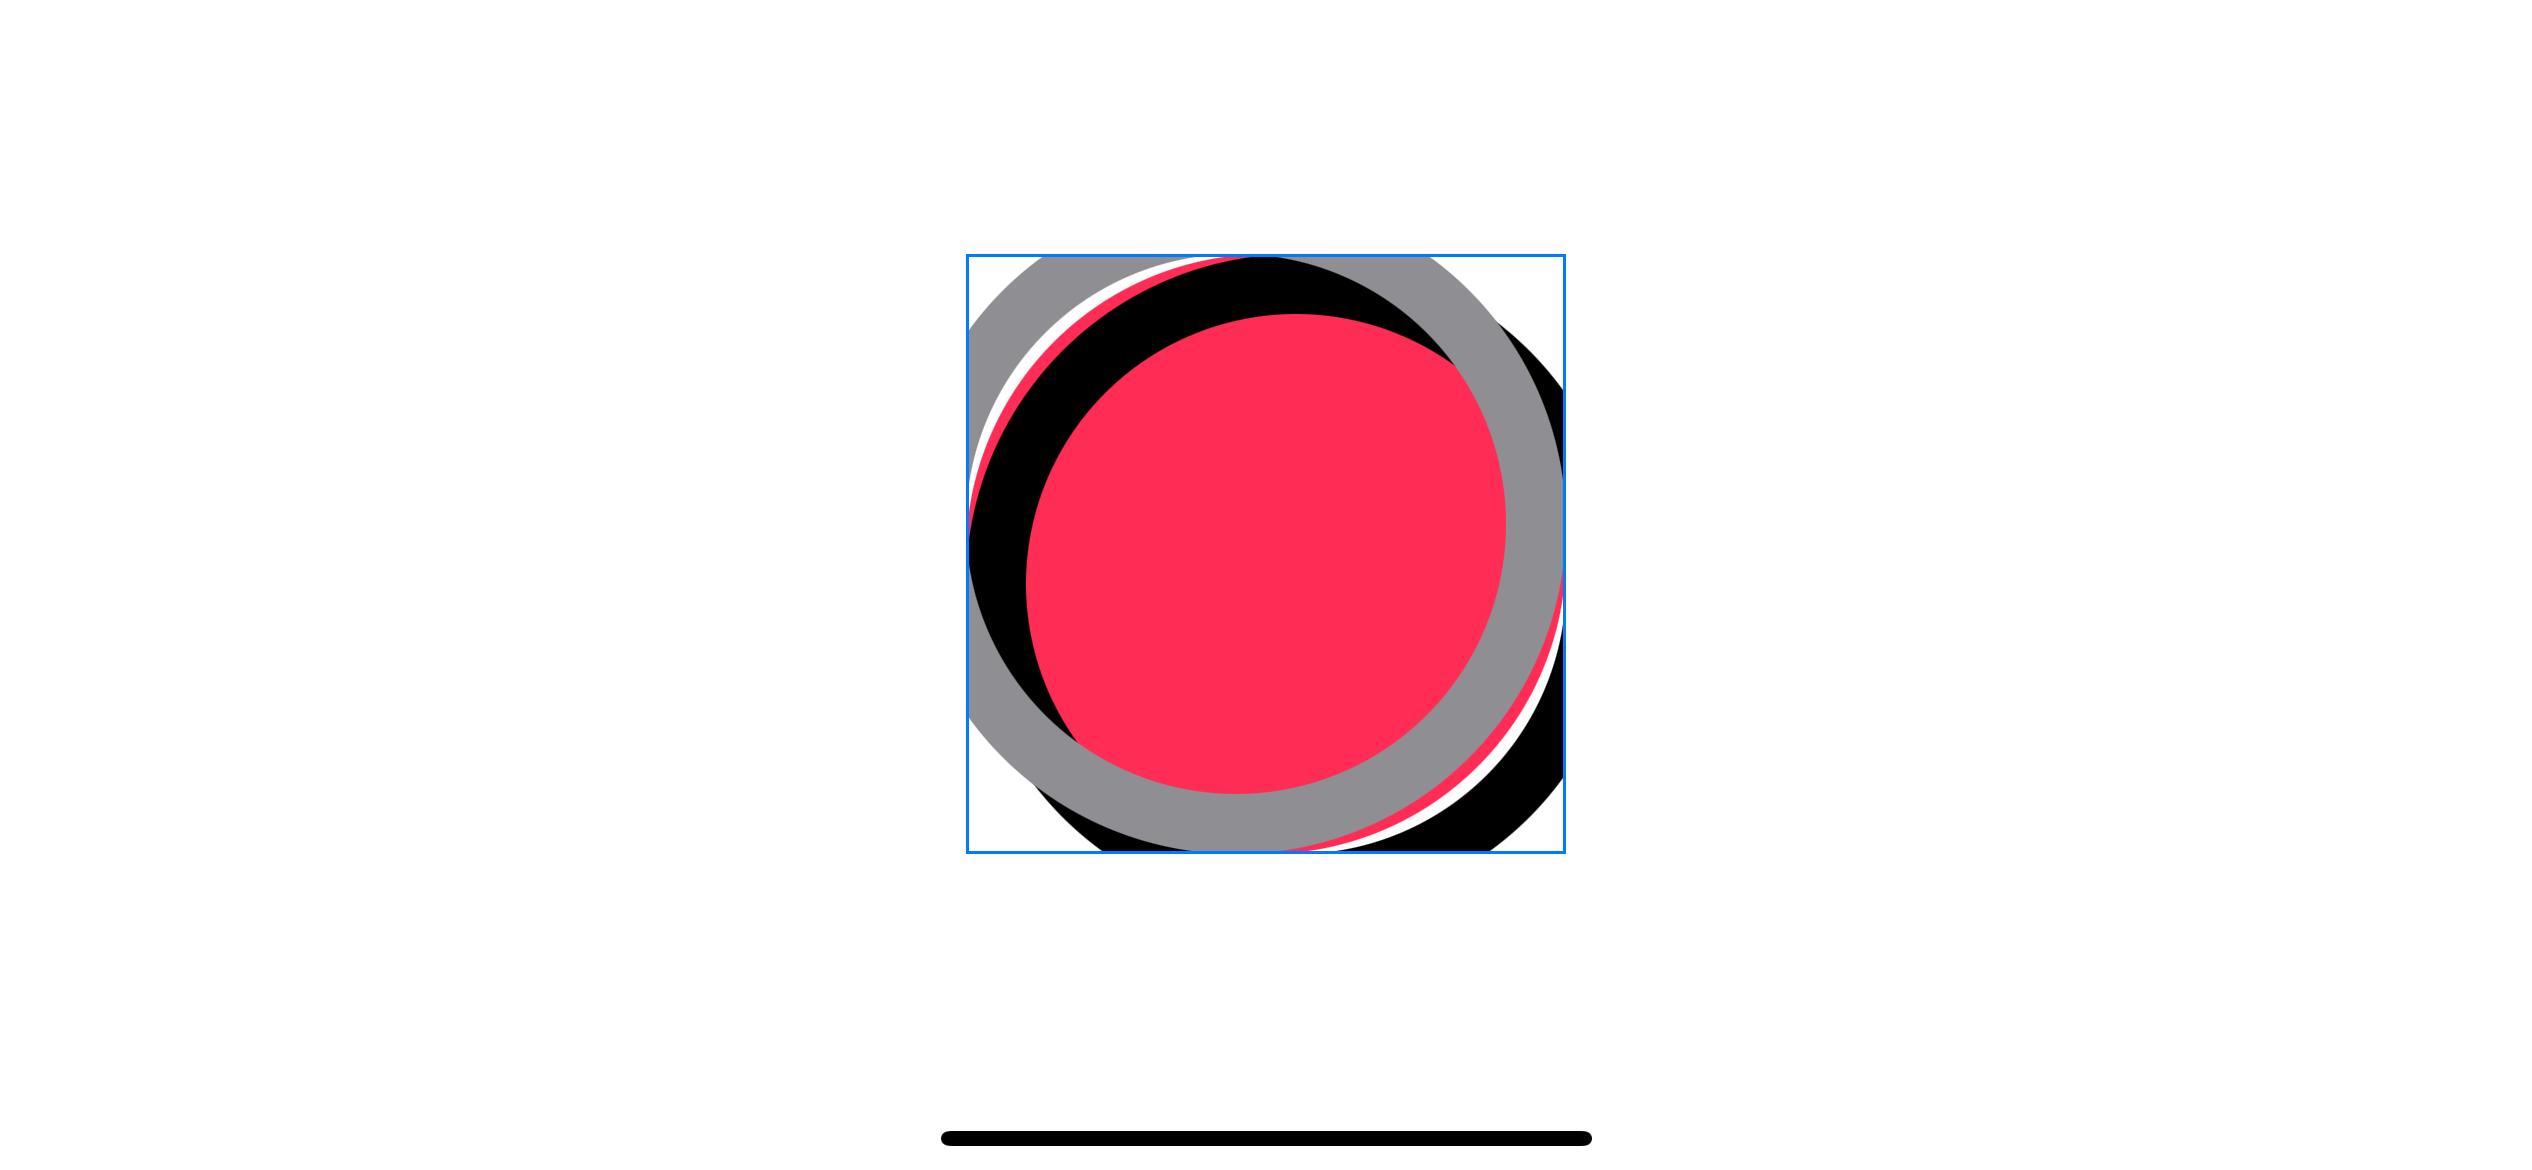 A bevel effect on a circular shape.